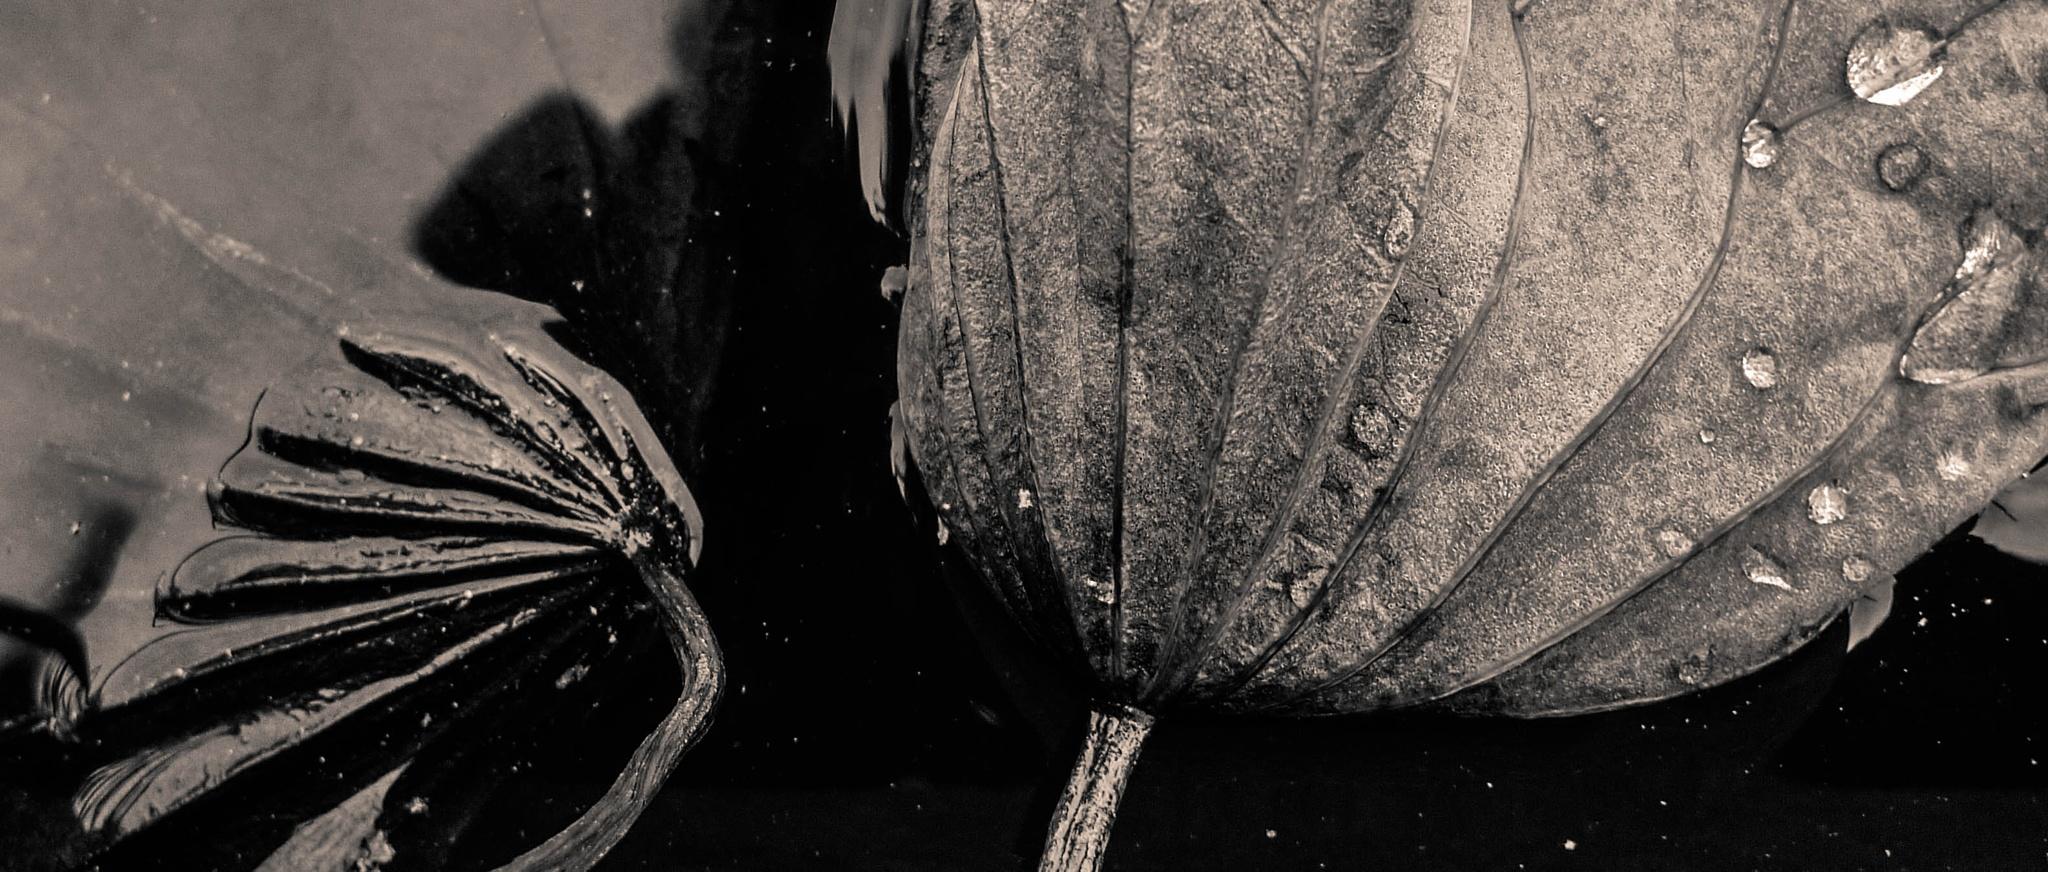 Stilleben mit Lotusblatt V by Stephan Winkler